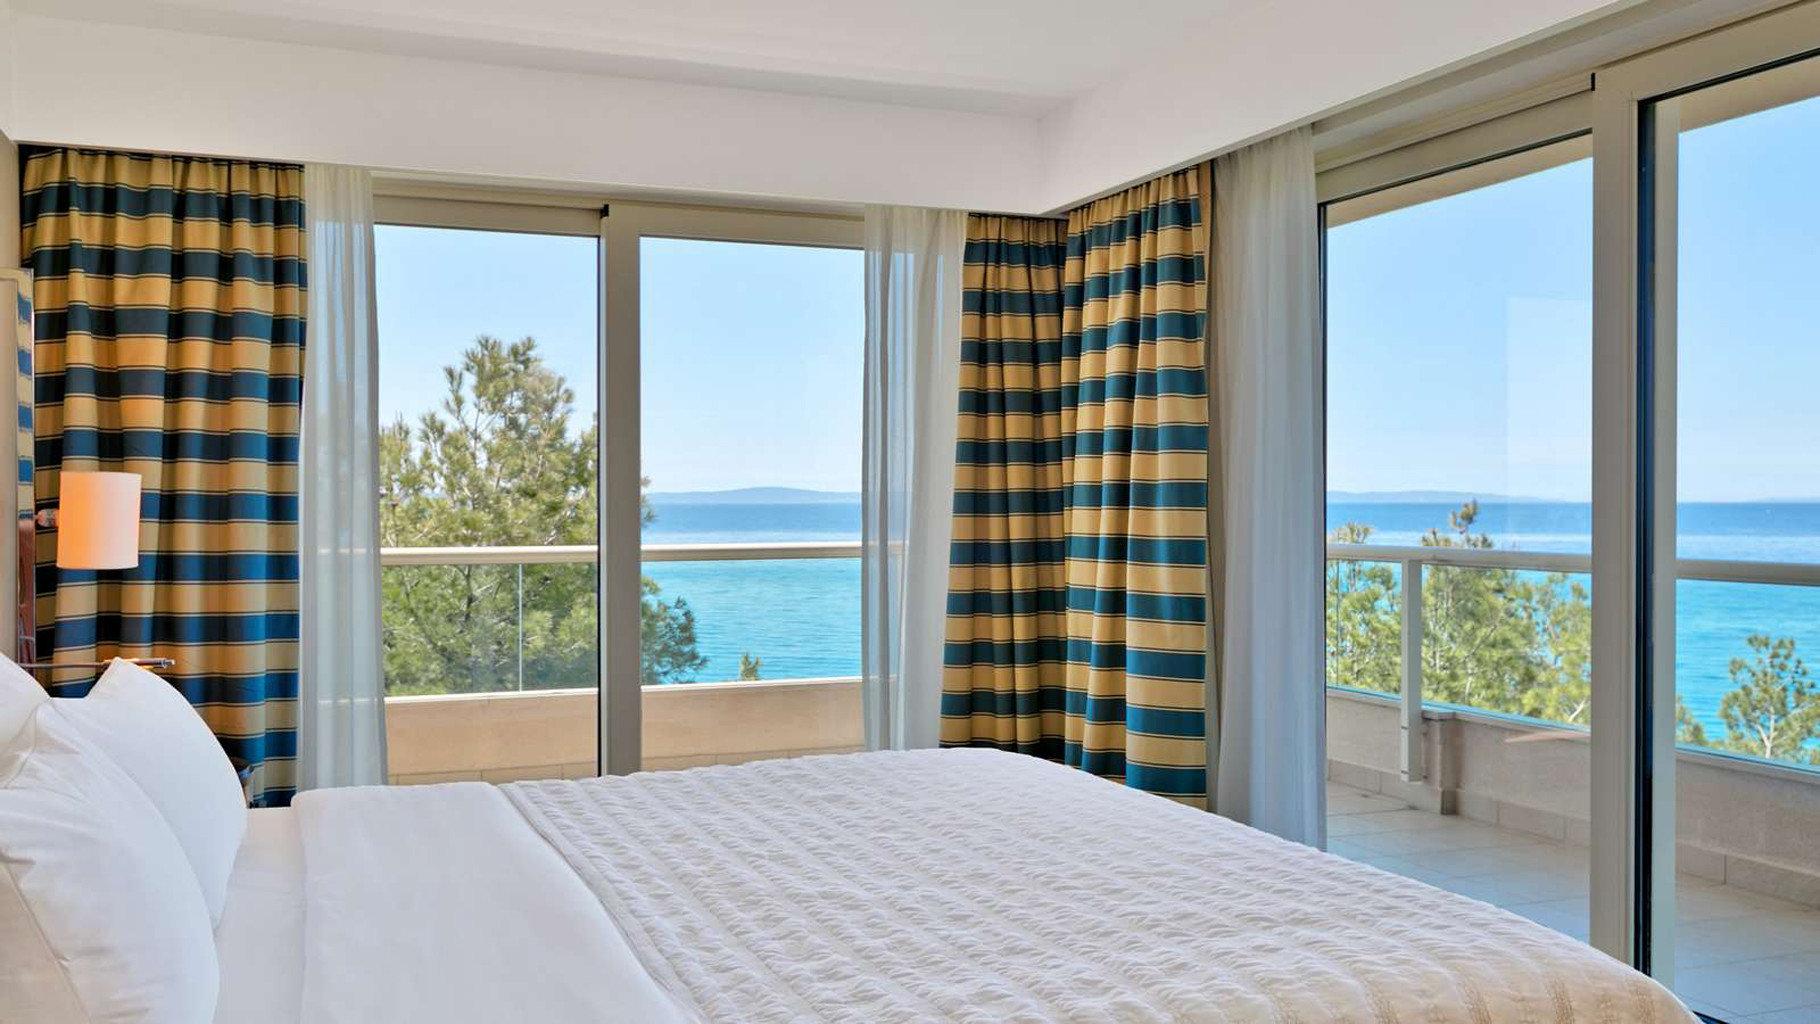 property Bedroom Suite condominium overlooking cottage curtain window treatment Modern